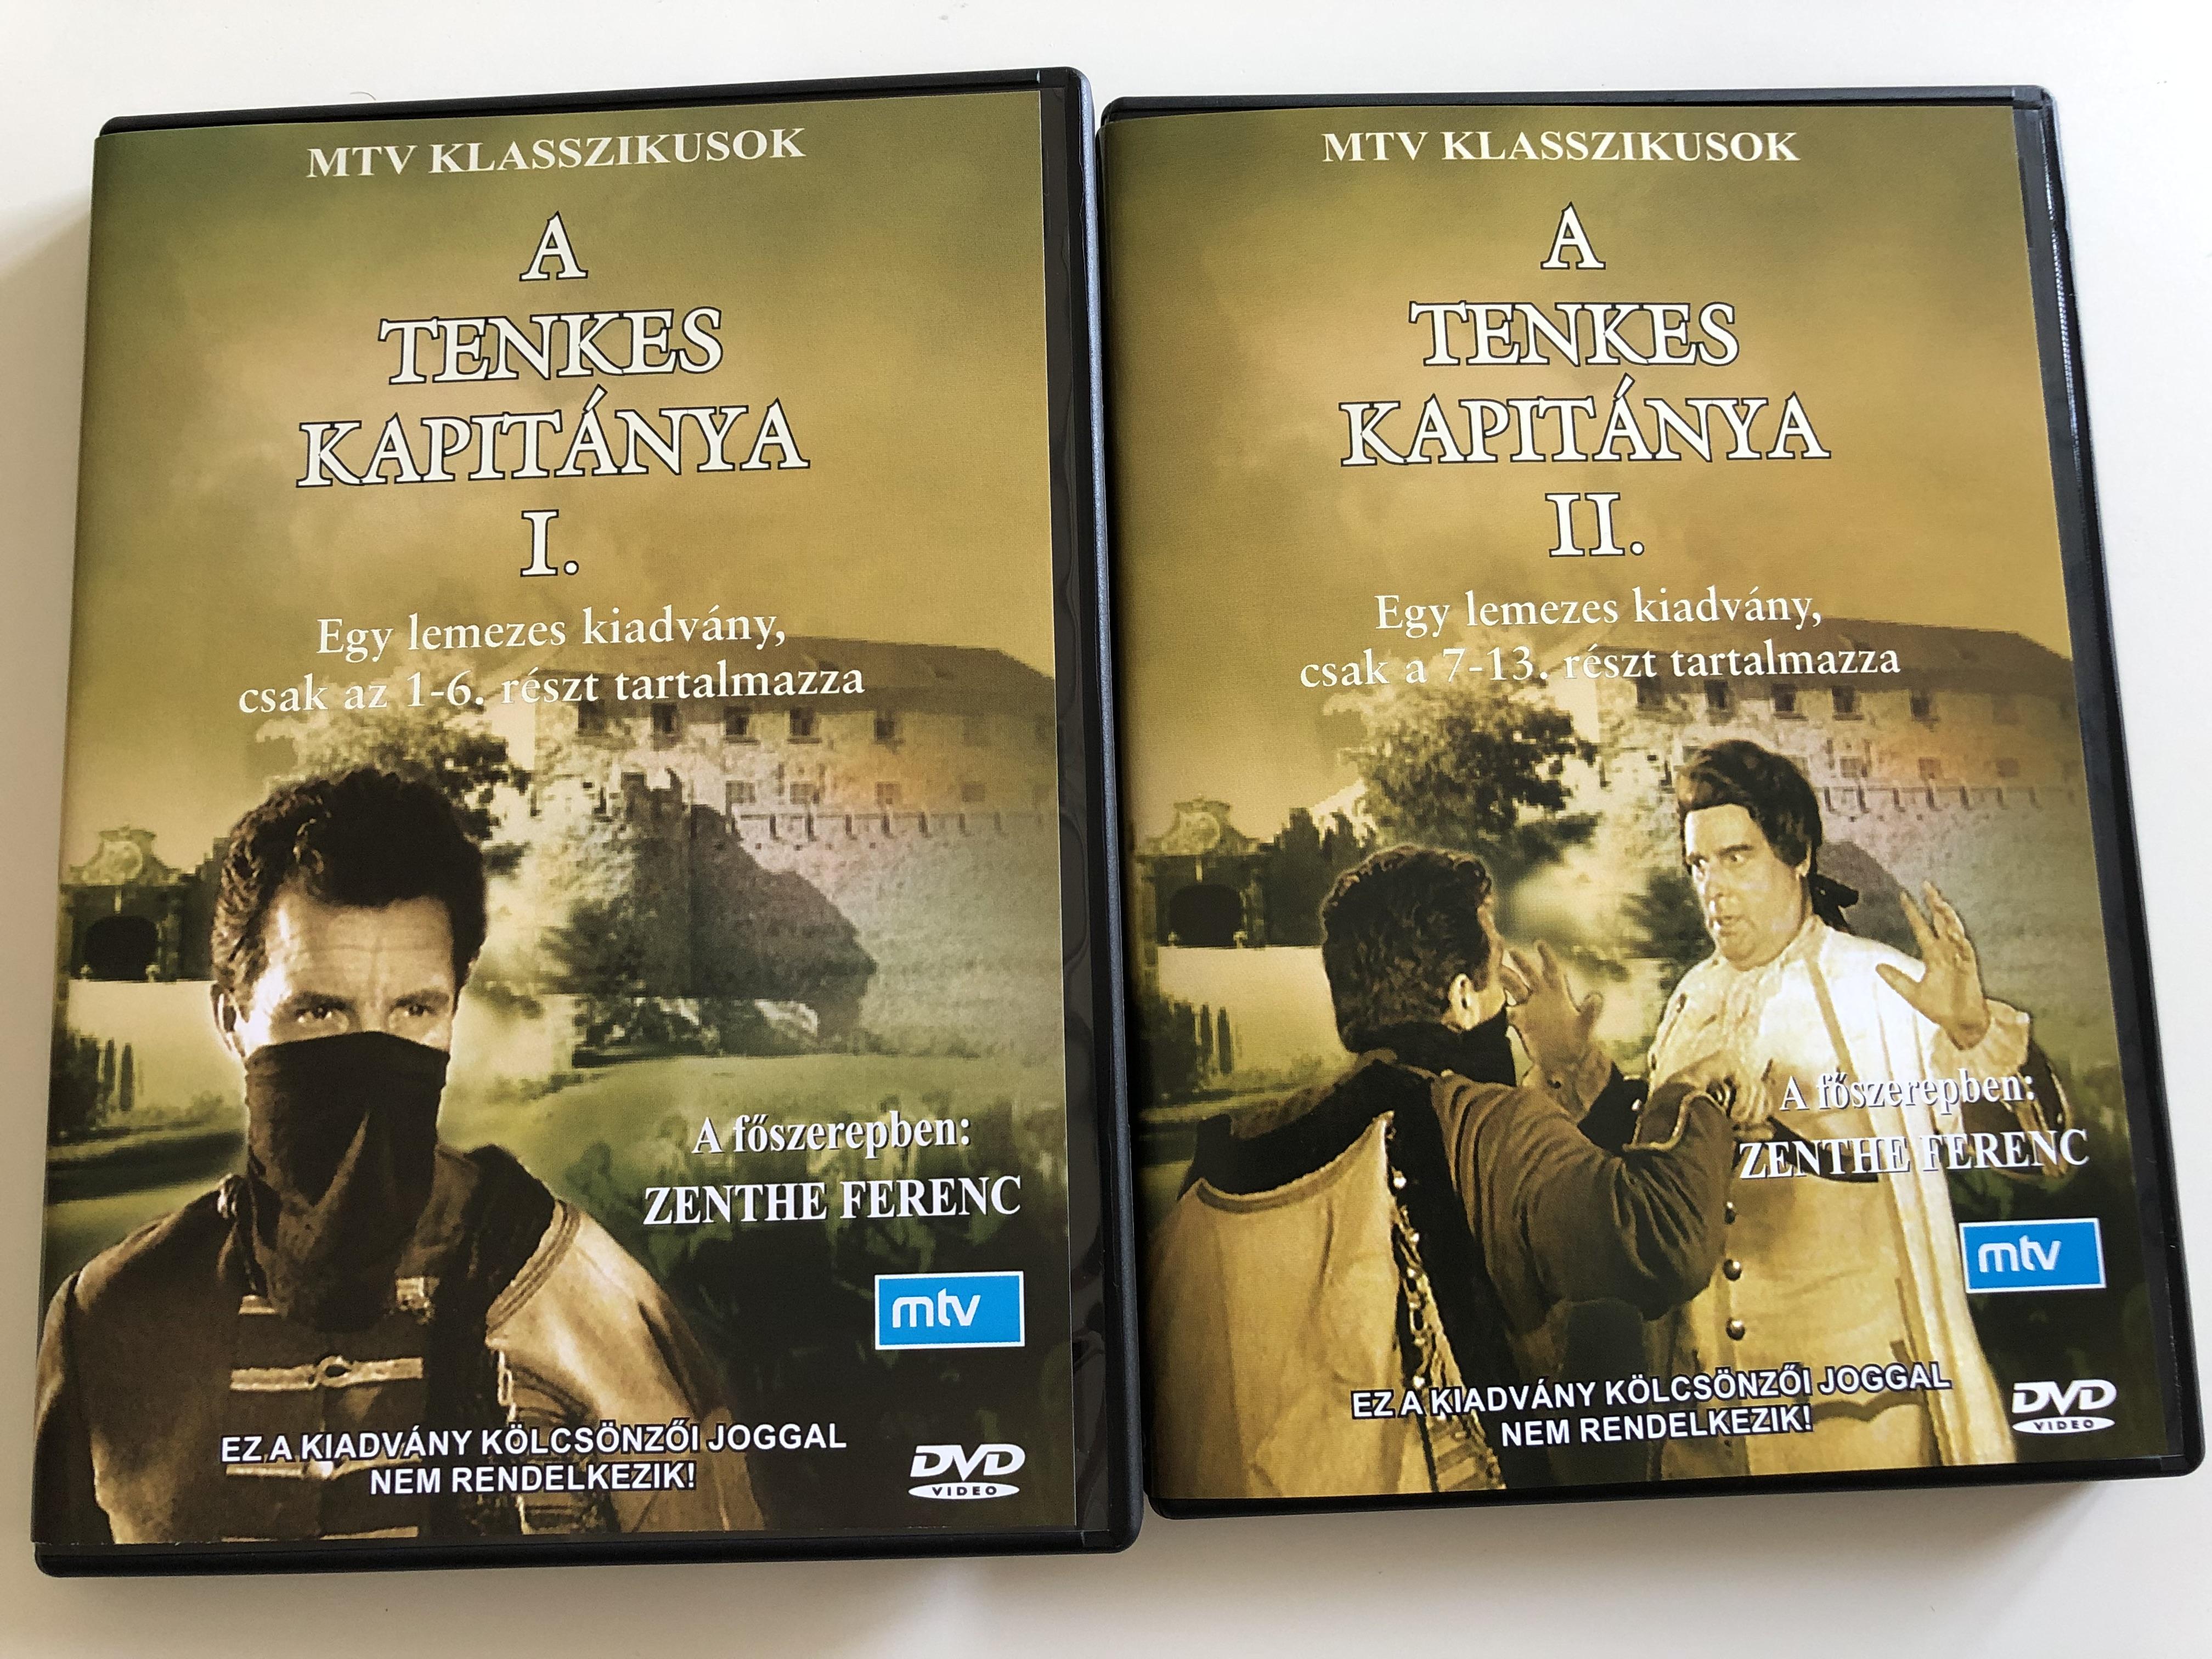 a-tenkes-kapit-nya-i.-ii.-dvd-set-1963-episodes-1-13.-directed-by-fej-r-tam-s-starring-zenthe-ferenc-ungv-ry-l-szl-krencsey-marianne-szab-gyula-p-csi-ildik-vajda-m-rta-mtv-klasszikusok.jpg